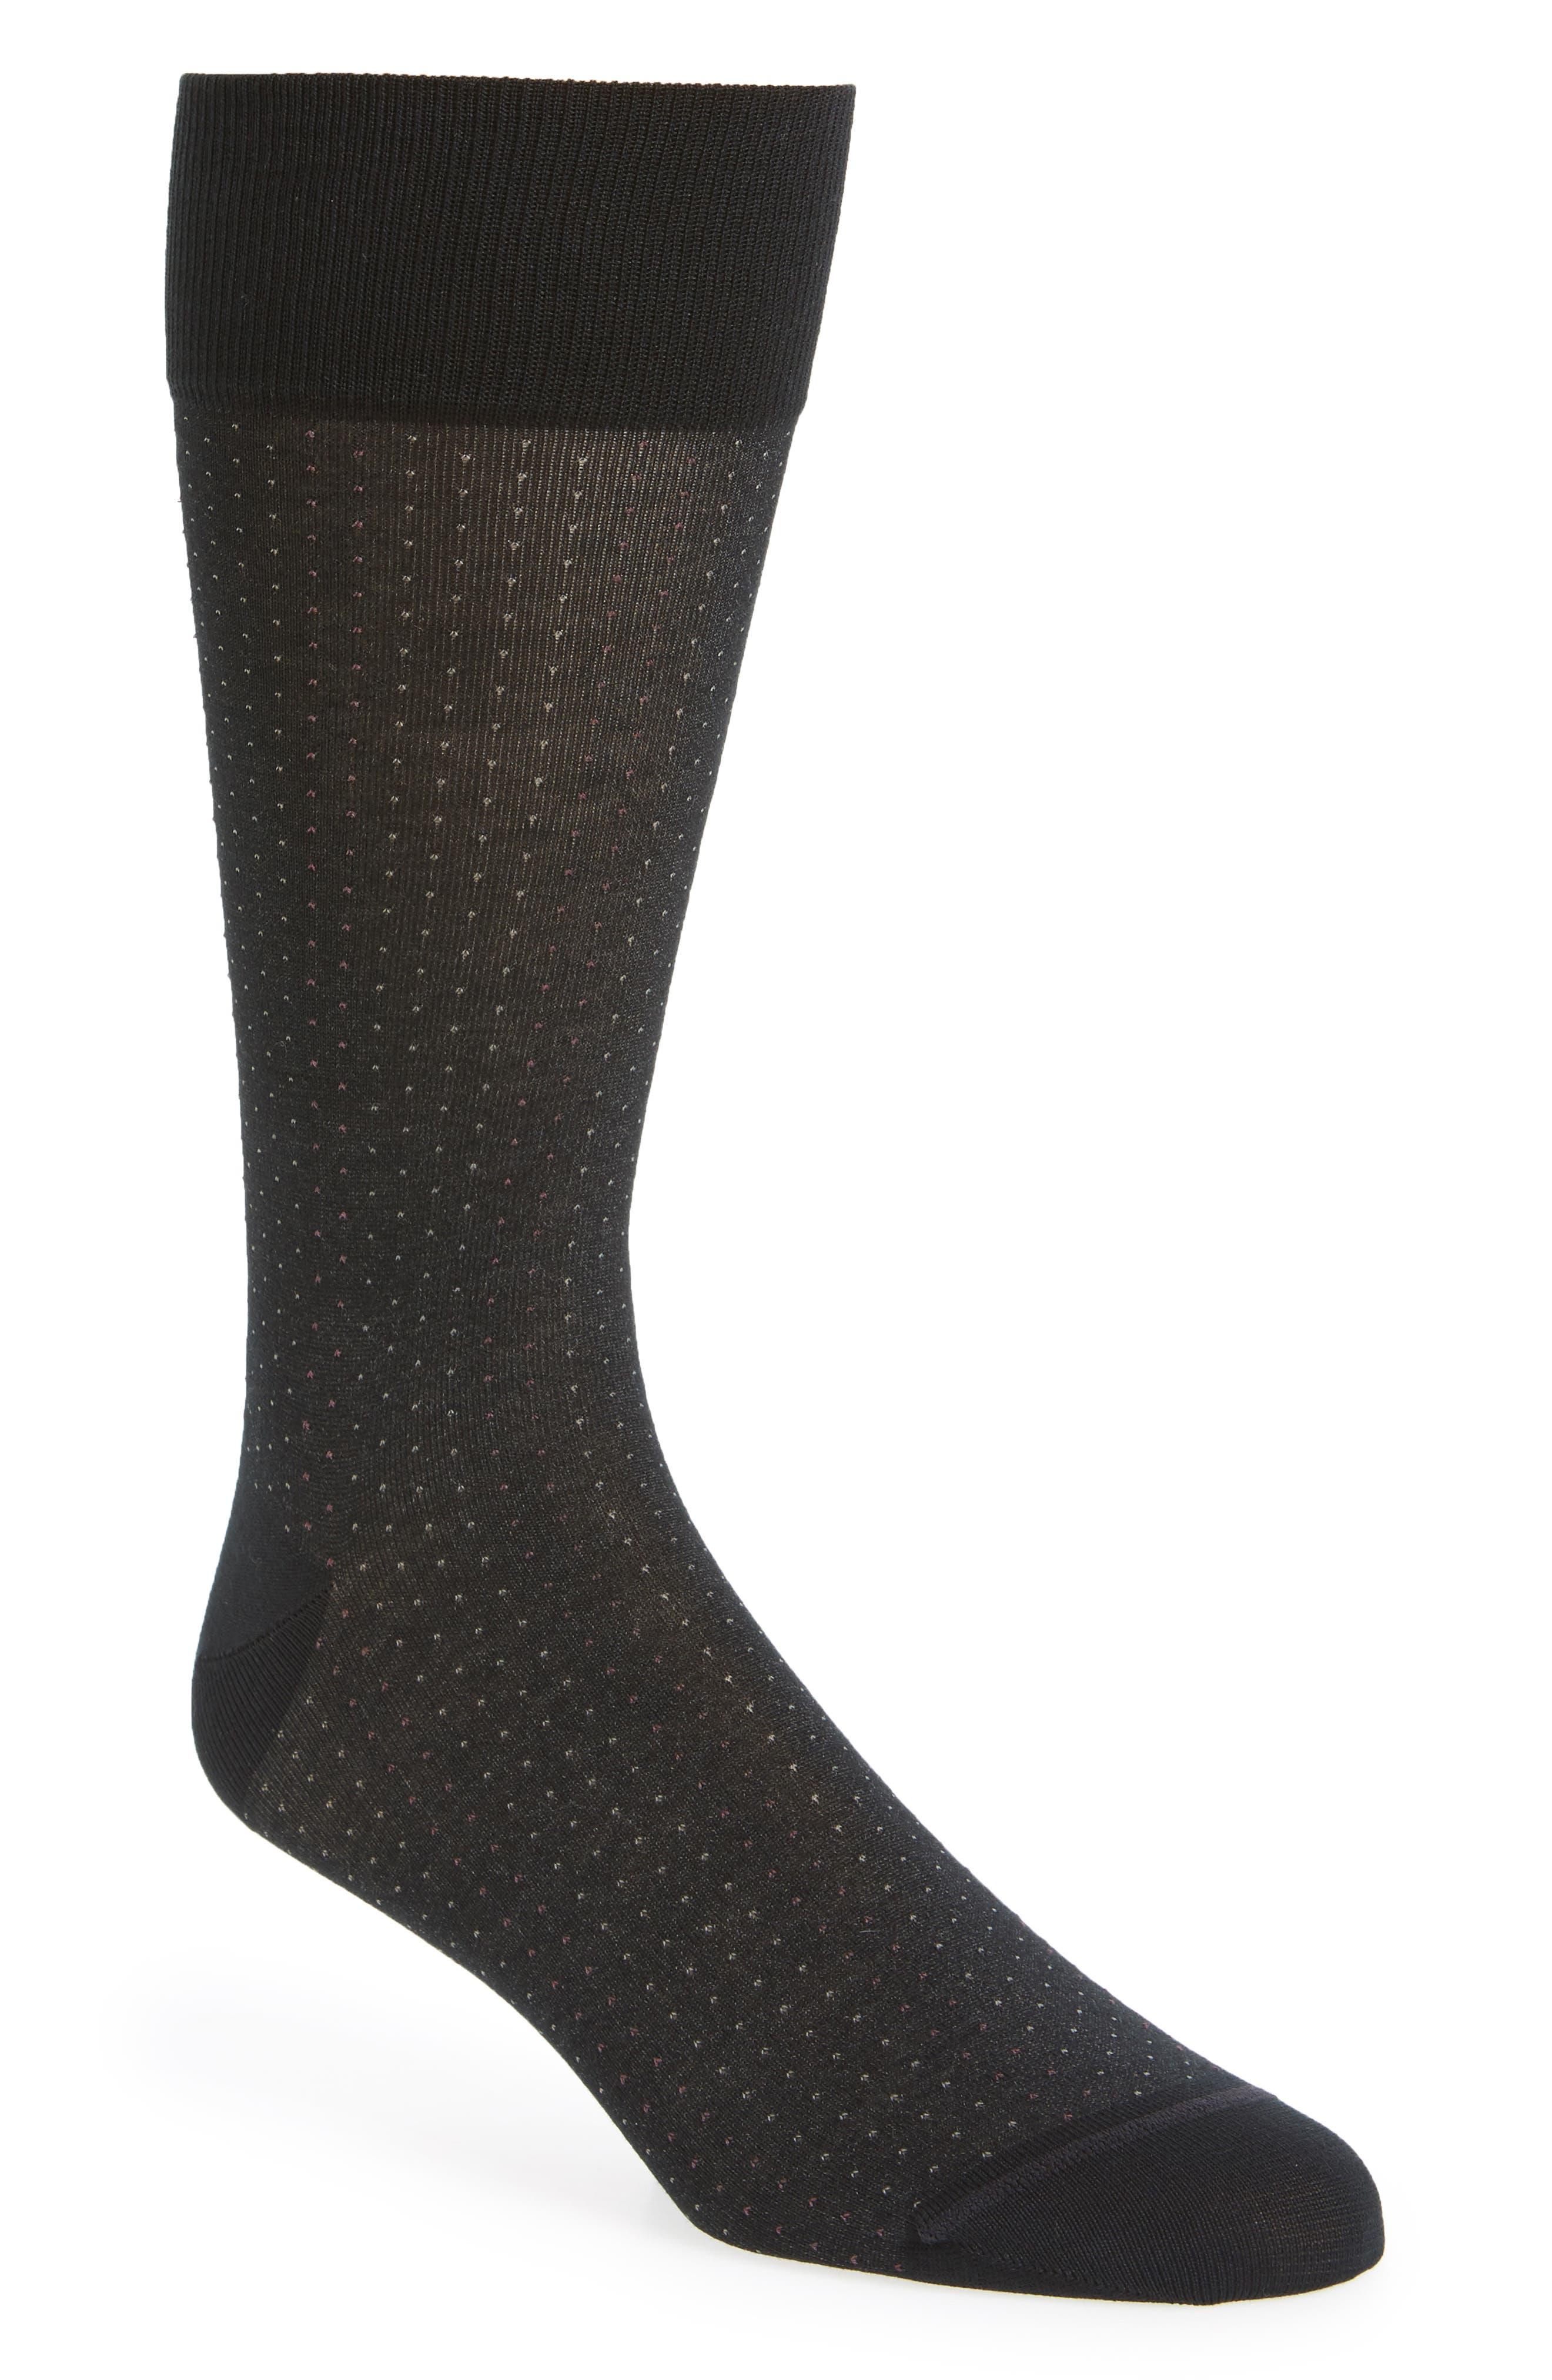 Birdseye Socks,                             Main thumbnail 1, color,                             001